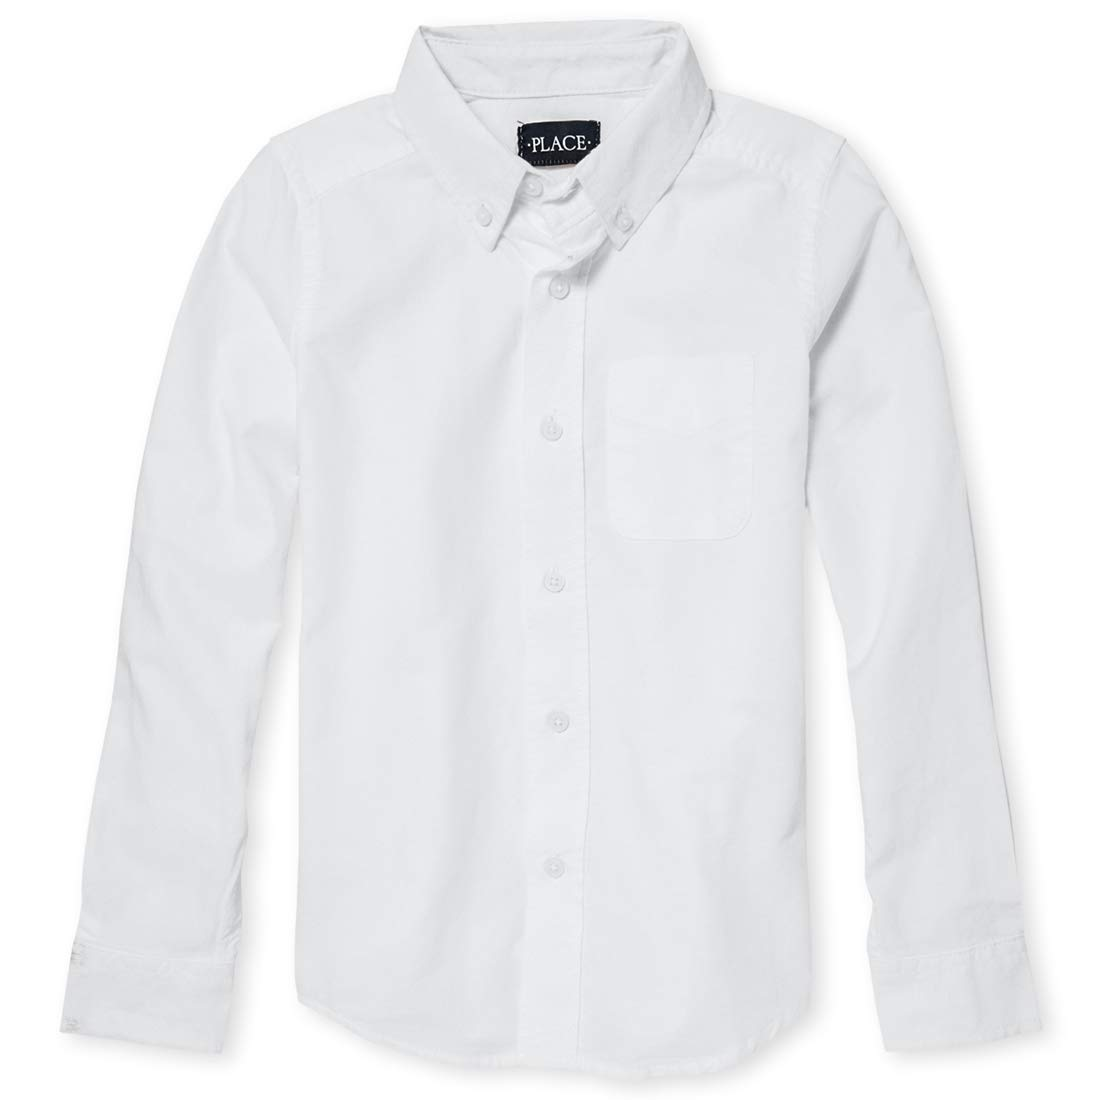 The Children's Place Big Boys' Long Sleeve Uniform Oxford Shirt, White 5063, Medium/7/8 by The Children's Place